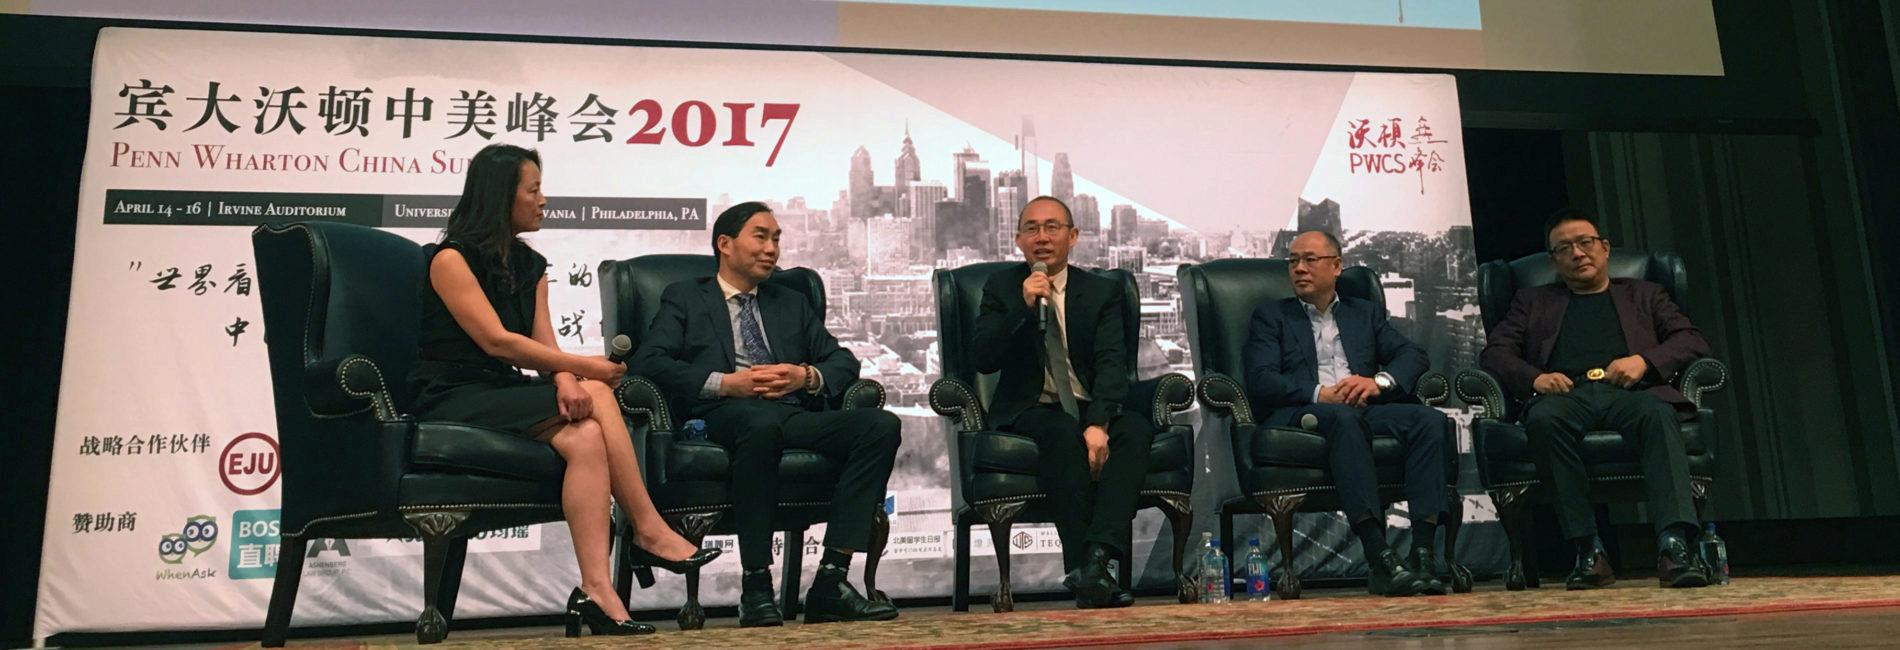 Penn Wharton China Summit